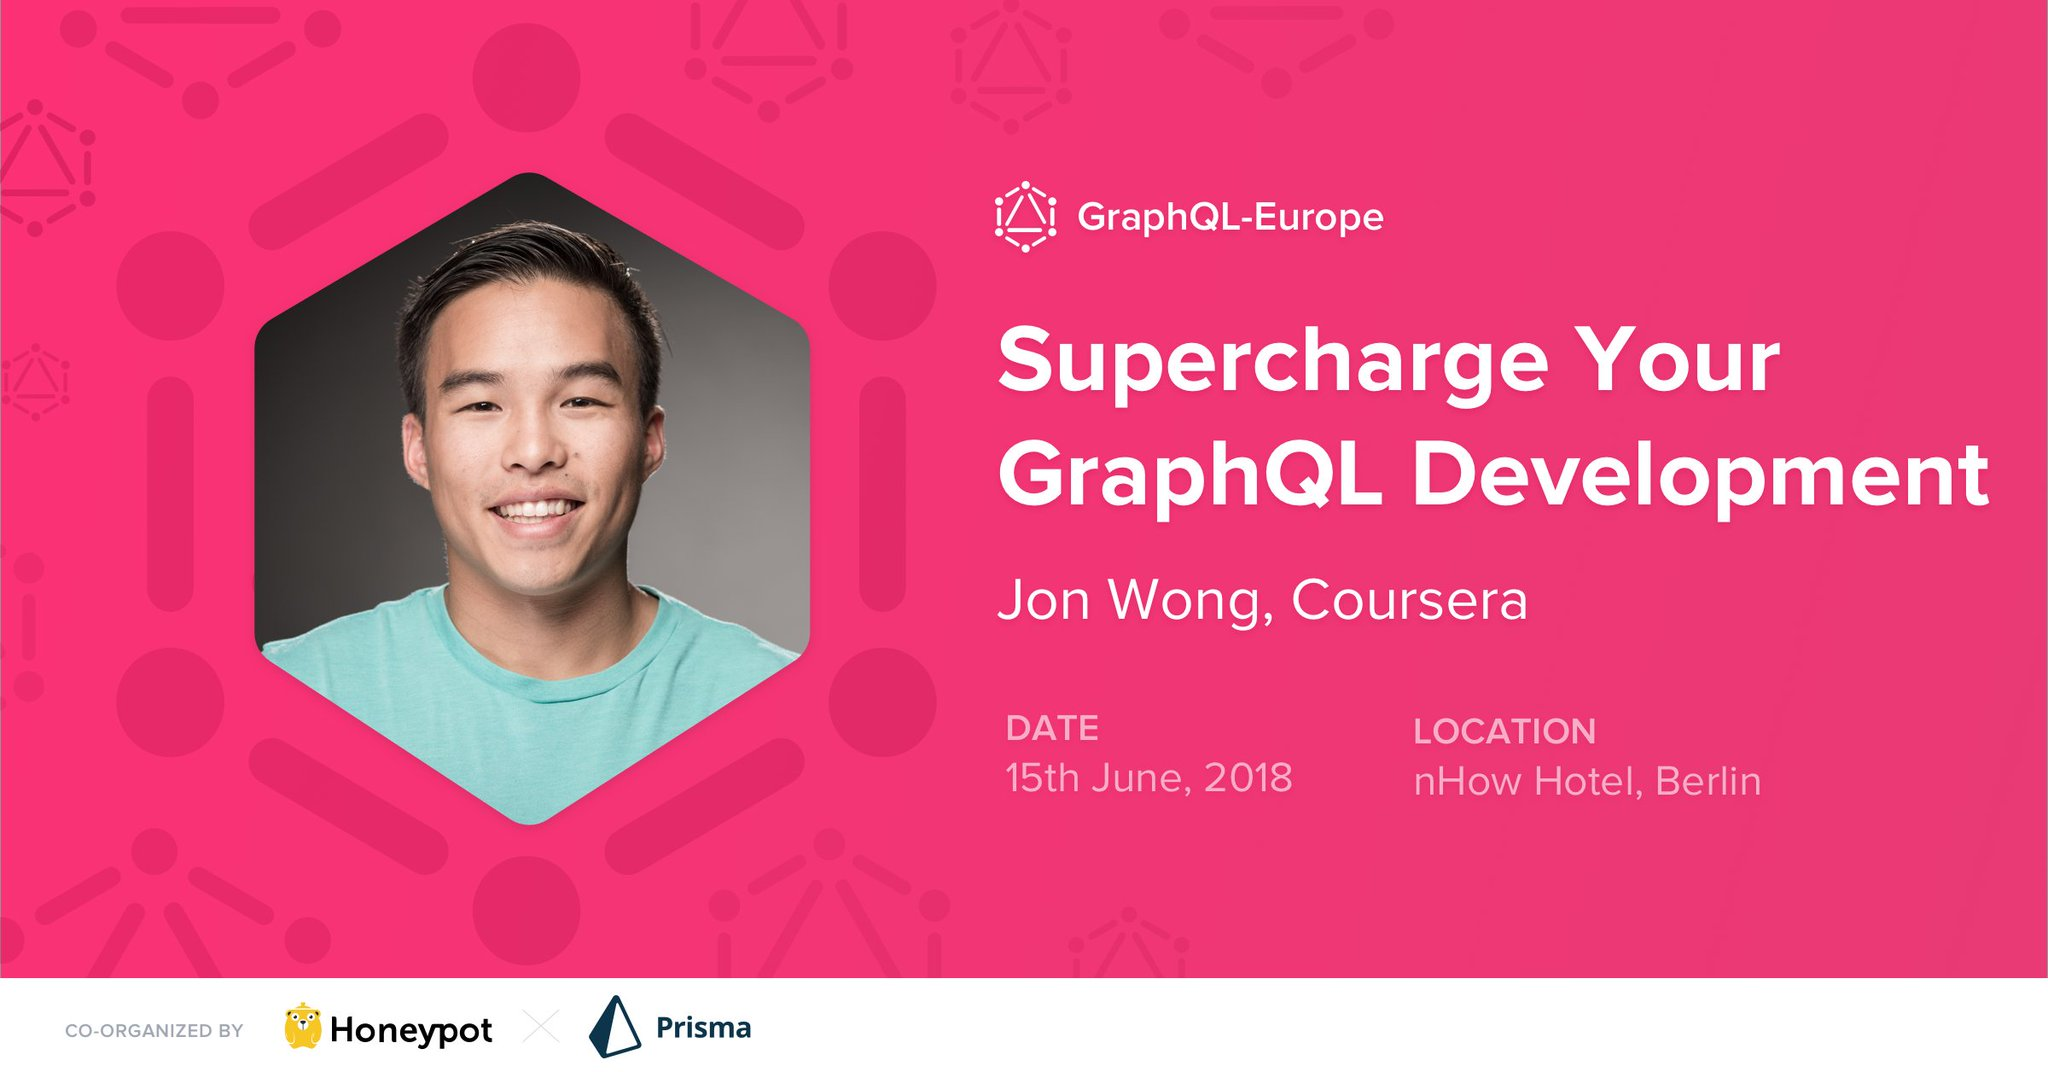 Supercharge Your GraphQL Development